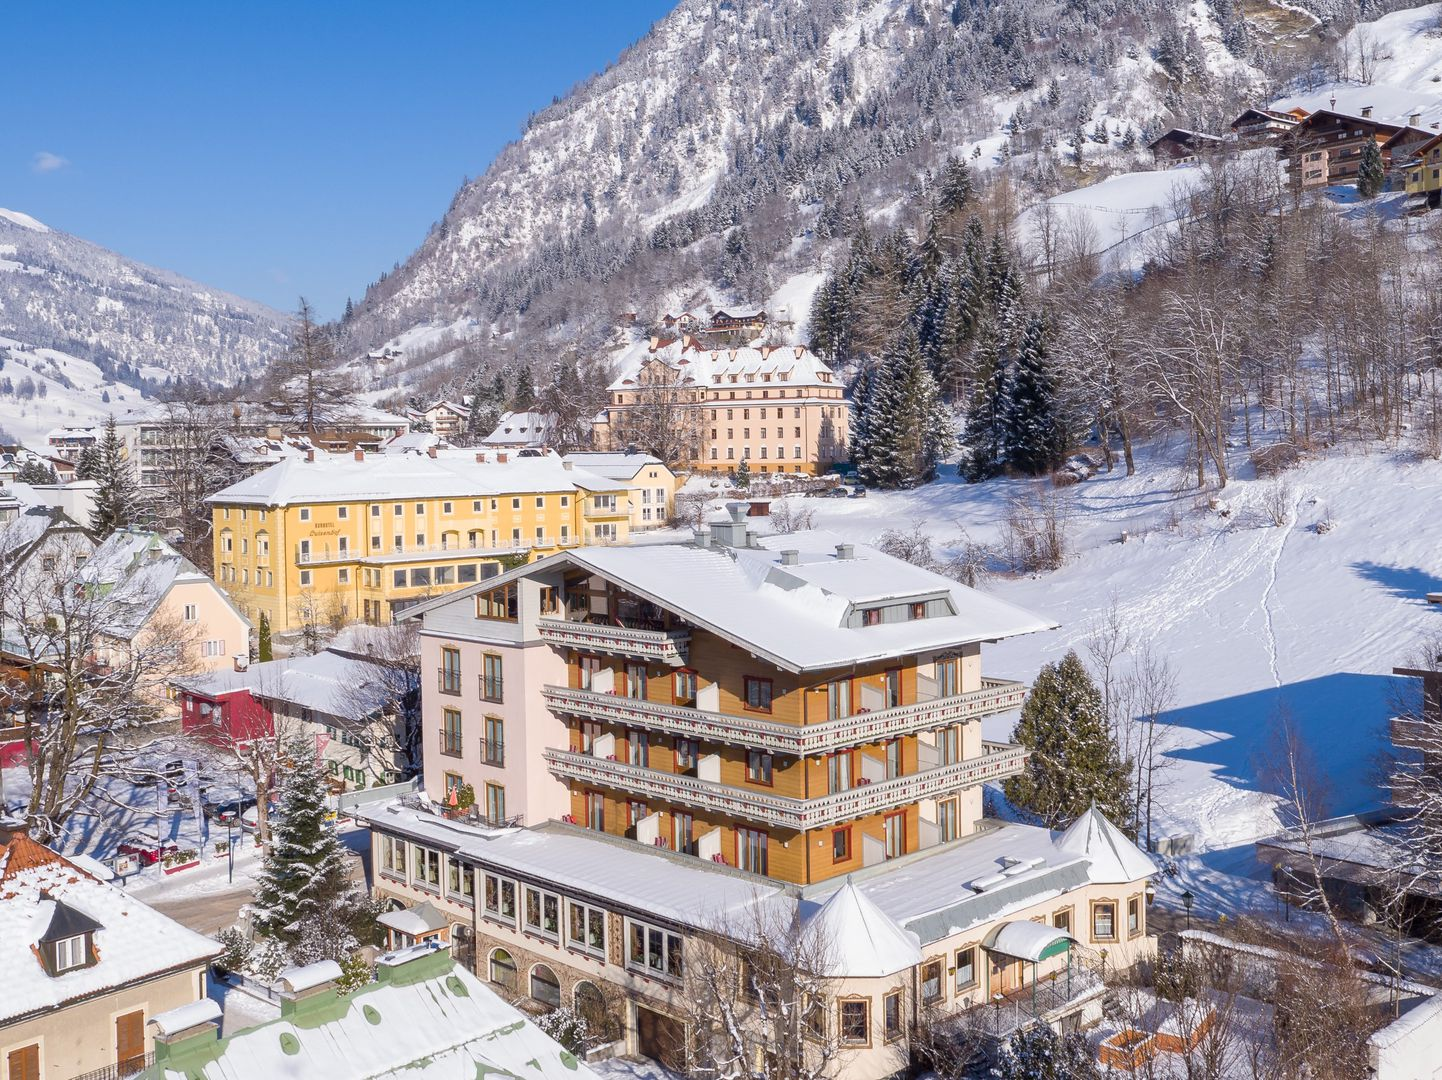 Hotel Volserhof - Slide 1